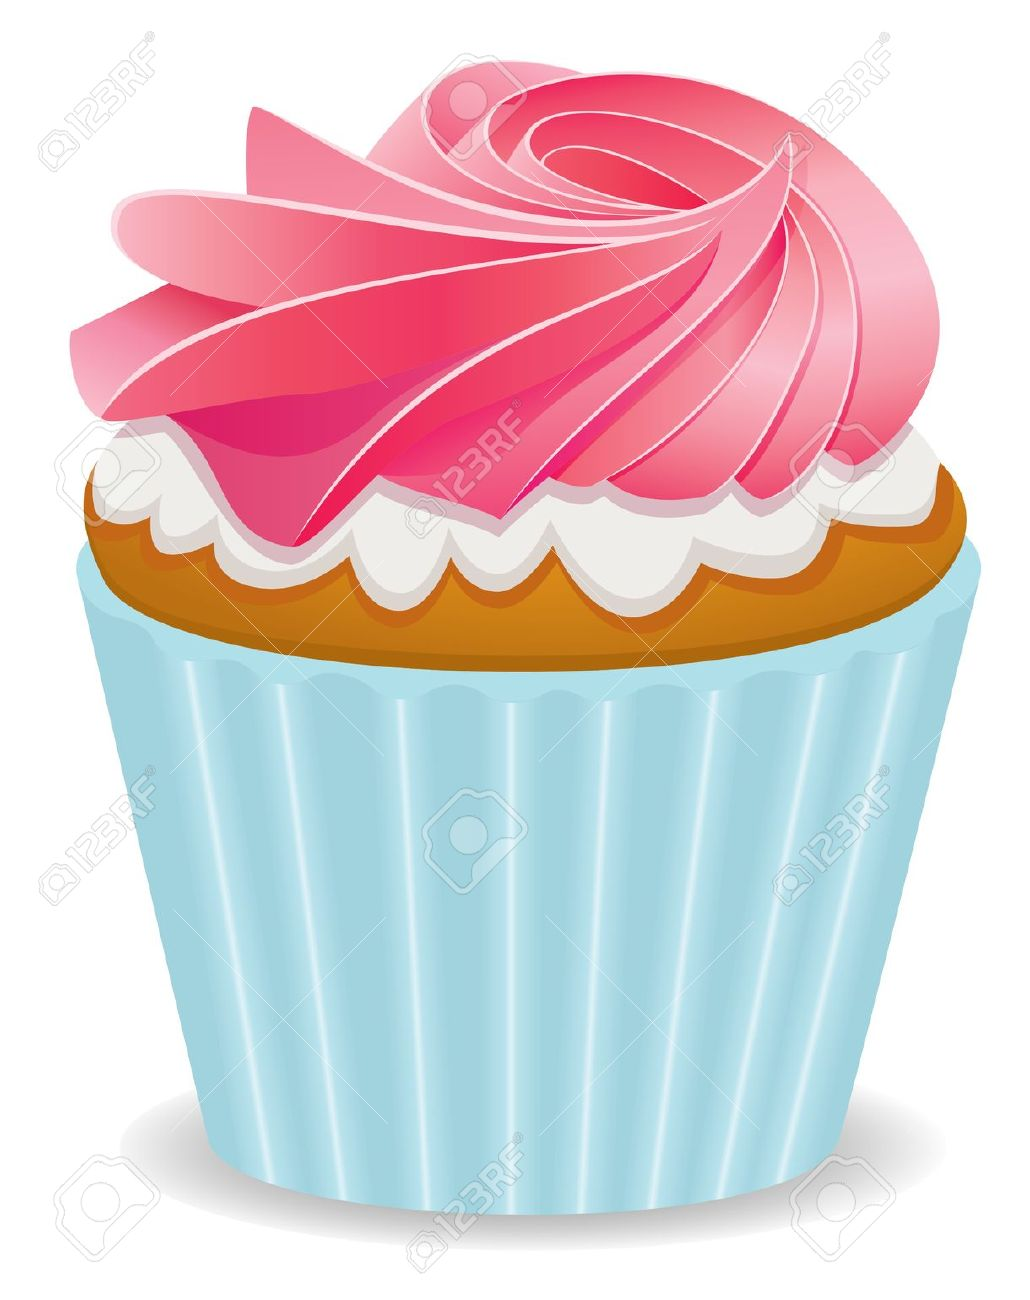 Fairy cake clipart.